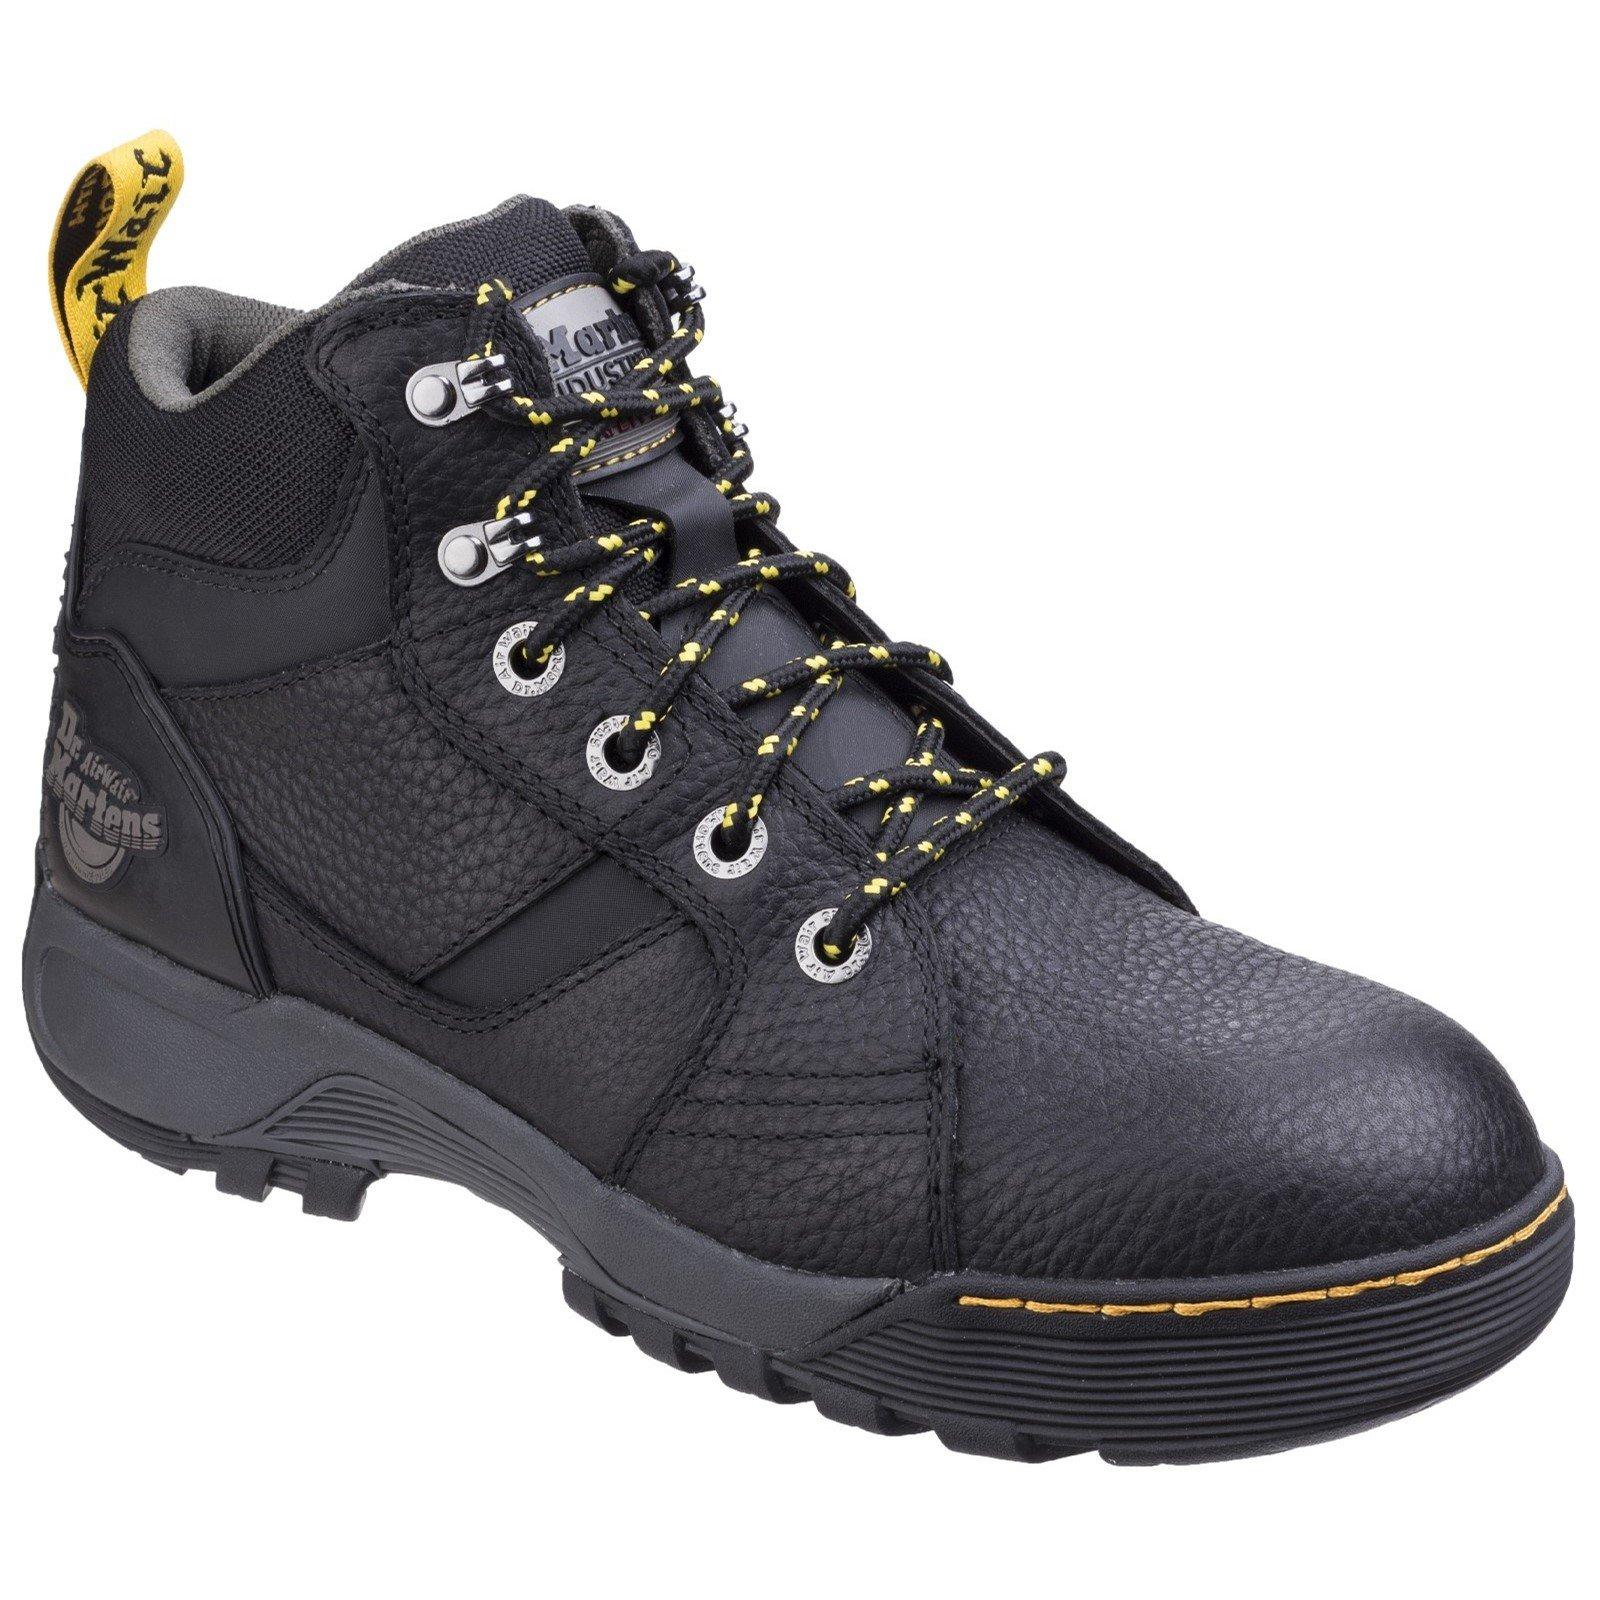 Dr Martens Men's Grapple Safety Boot Various Colours 26023 - Black 8